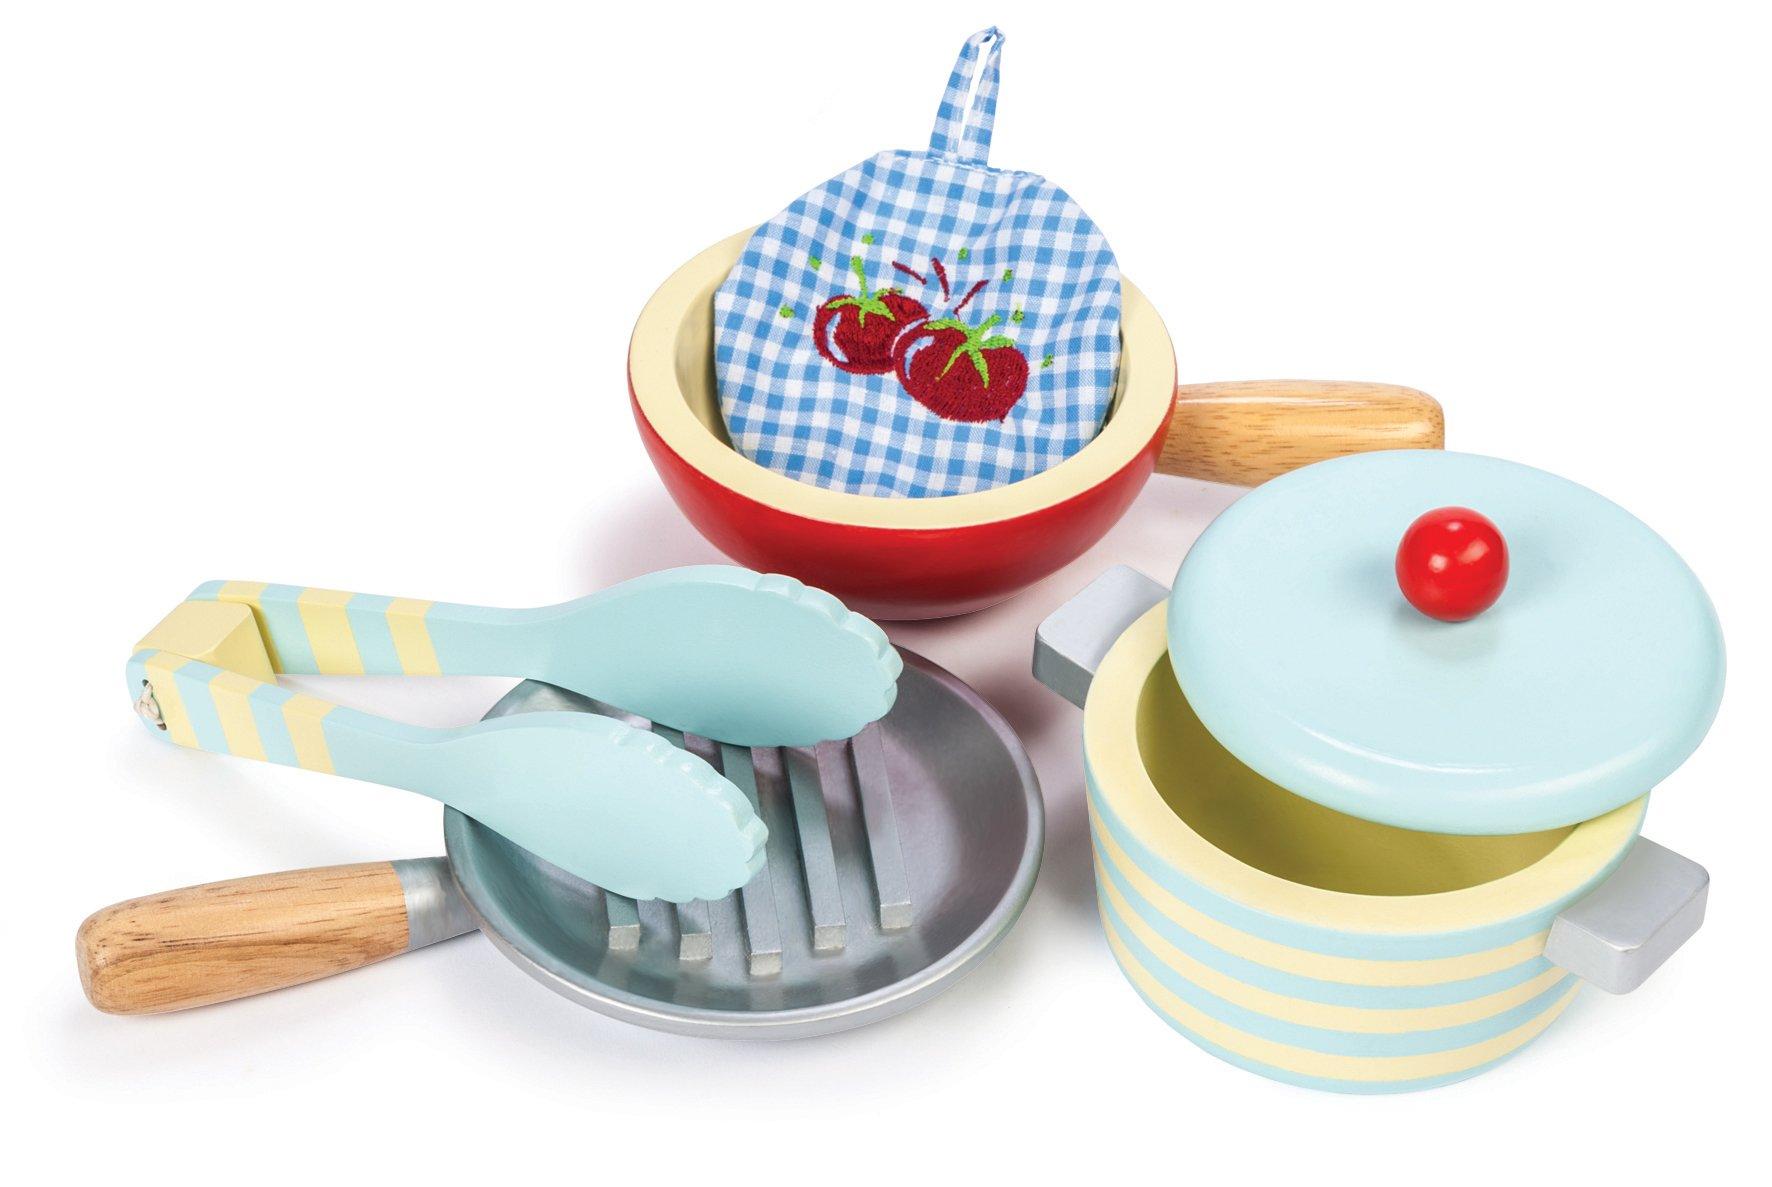 Letterland Le Toy Van Honeybake Wooden Pots and Pans Set